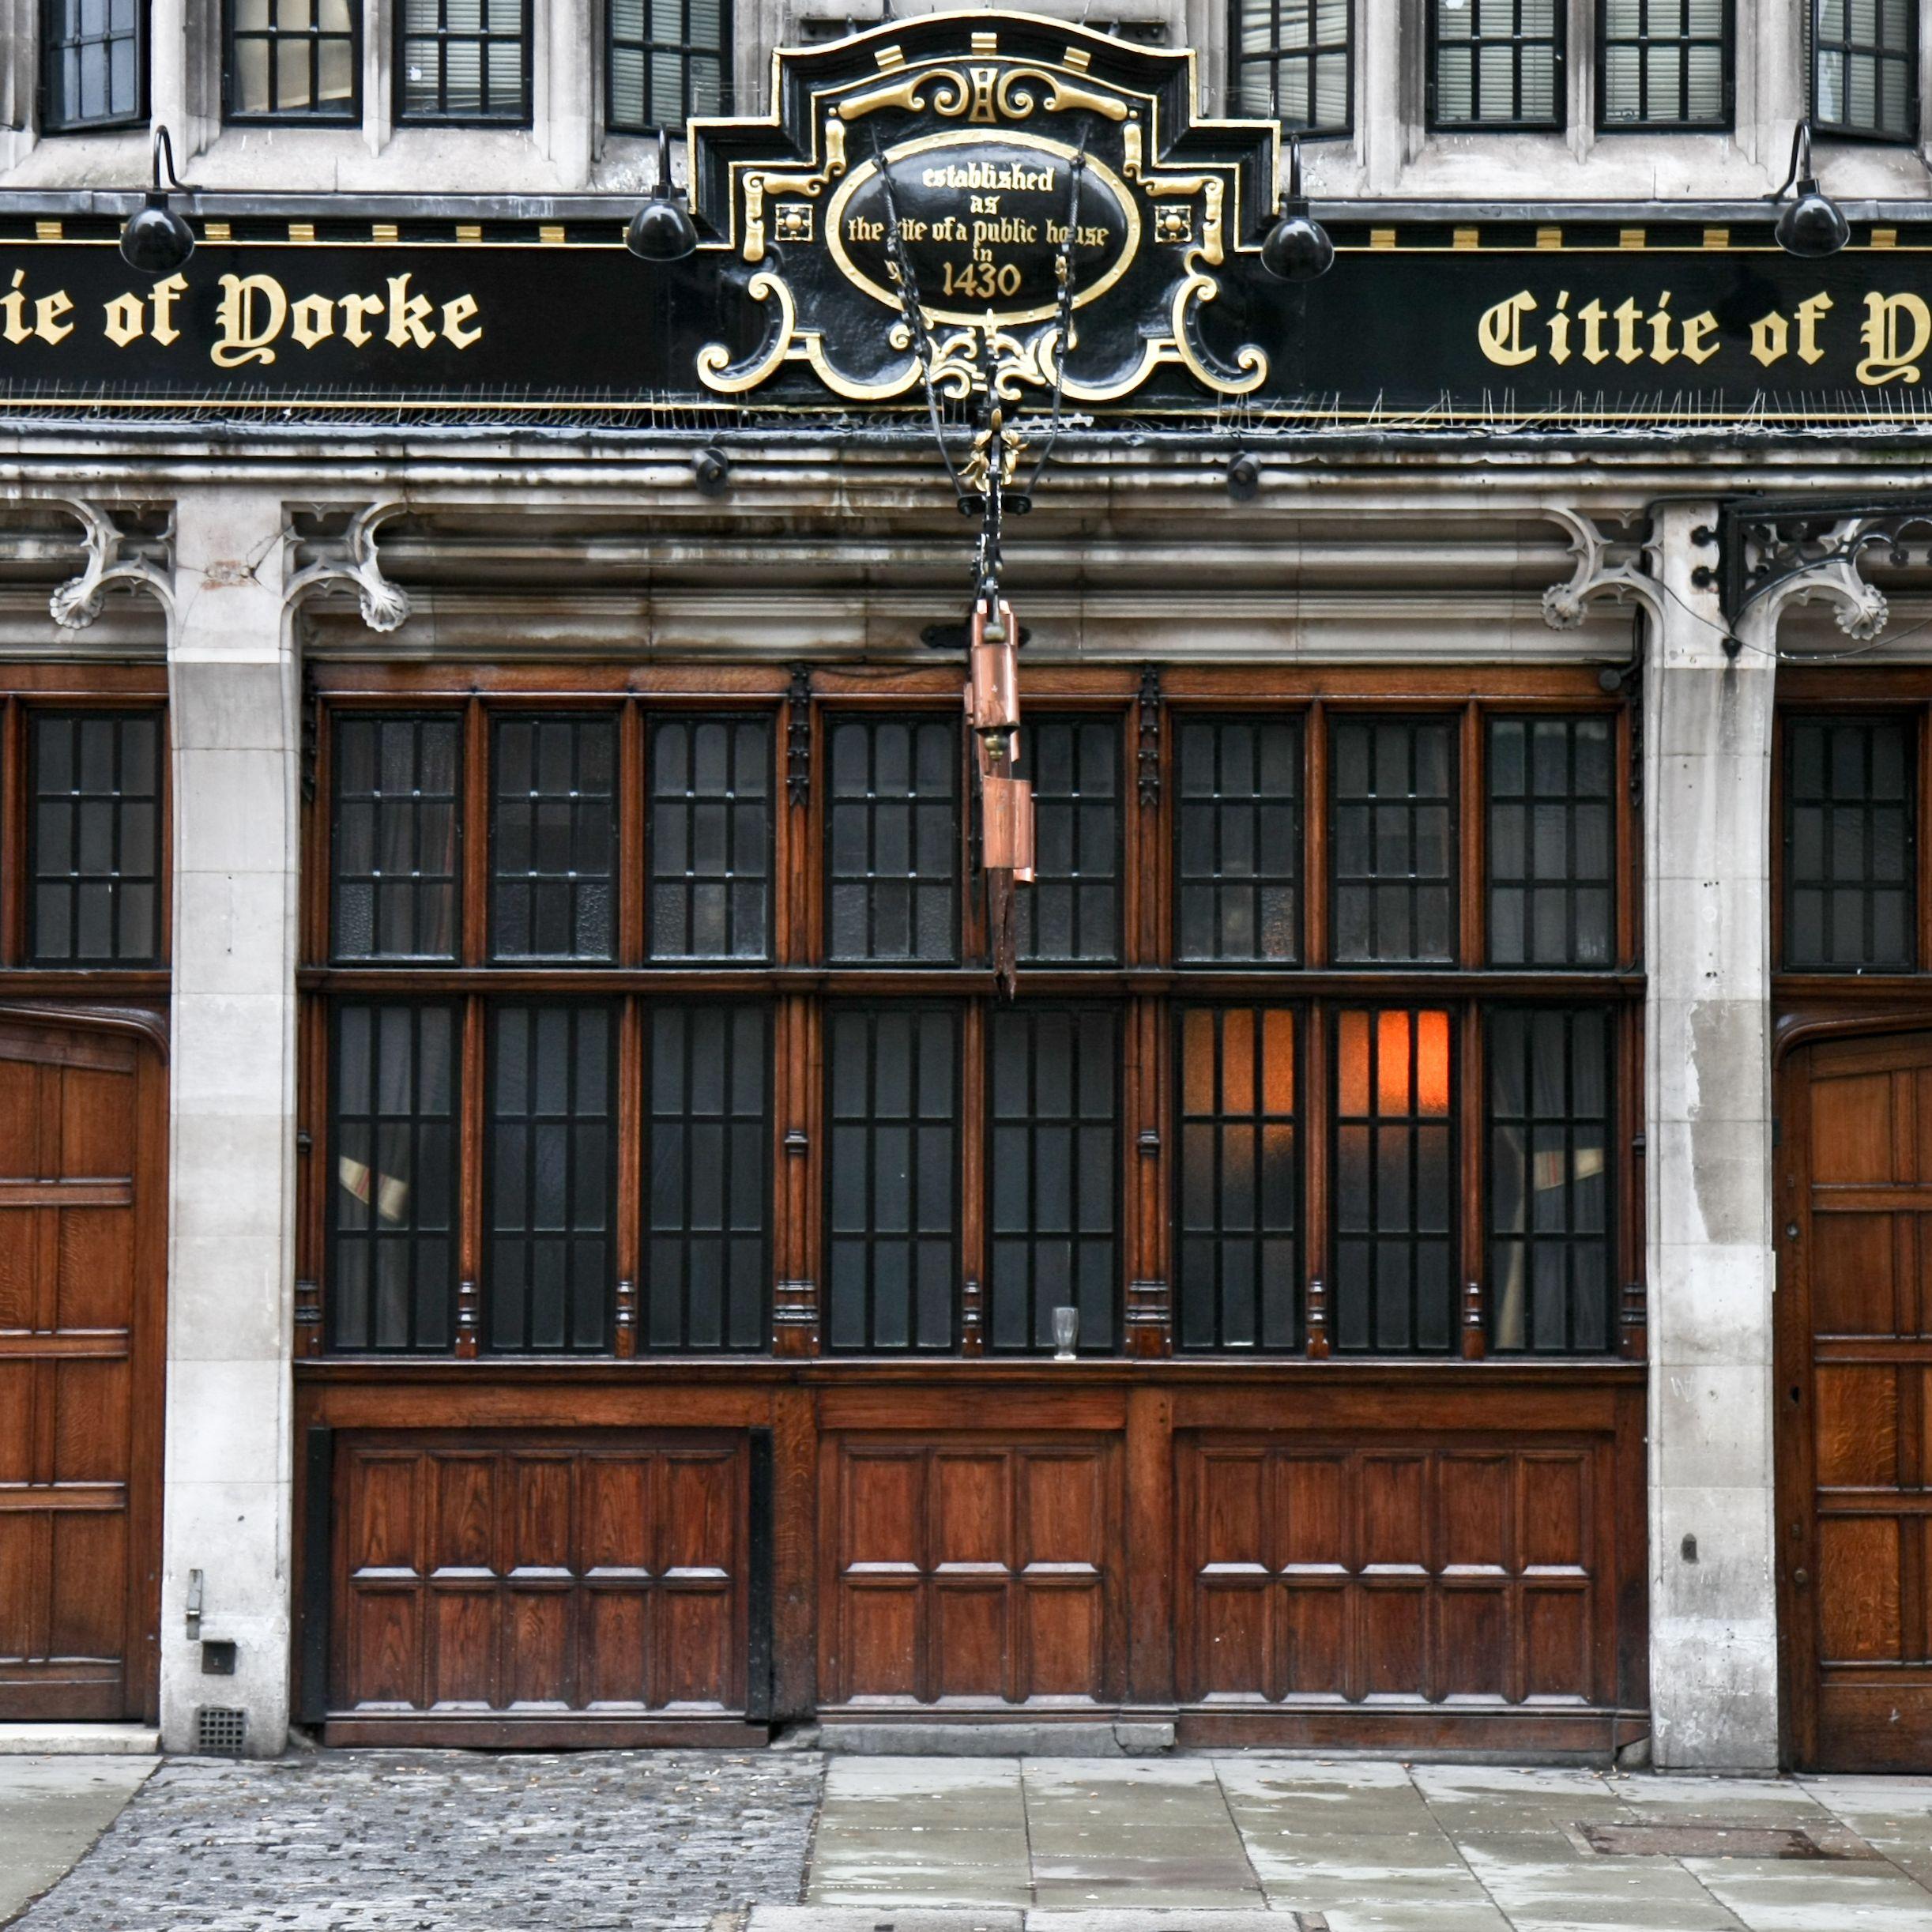 Cittie of yorke pub